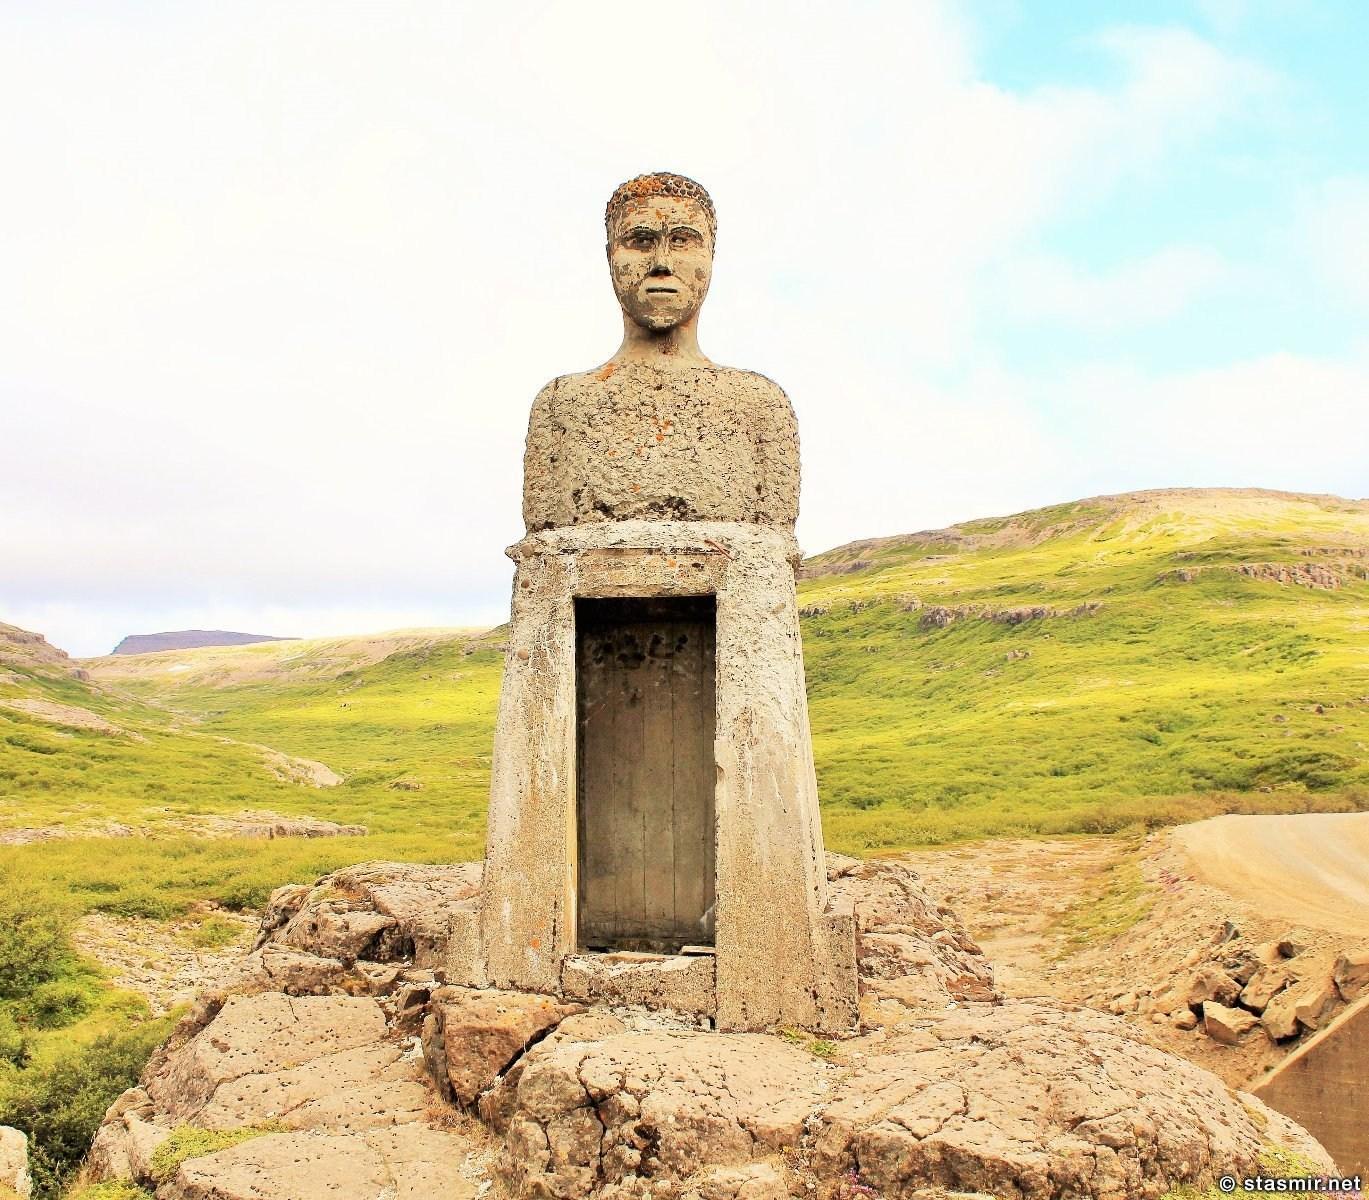 Gísli Síslason frá Hvammi, исландский юмор, practical joke, исландская скульптура, фото Стасмир, Photo Stasmir